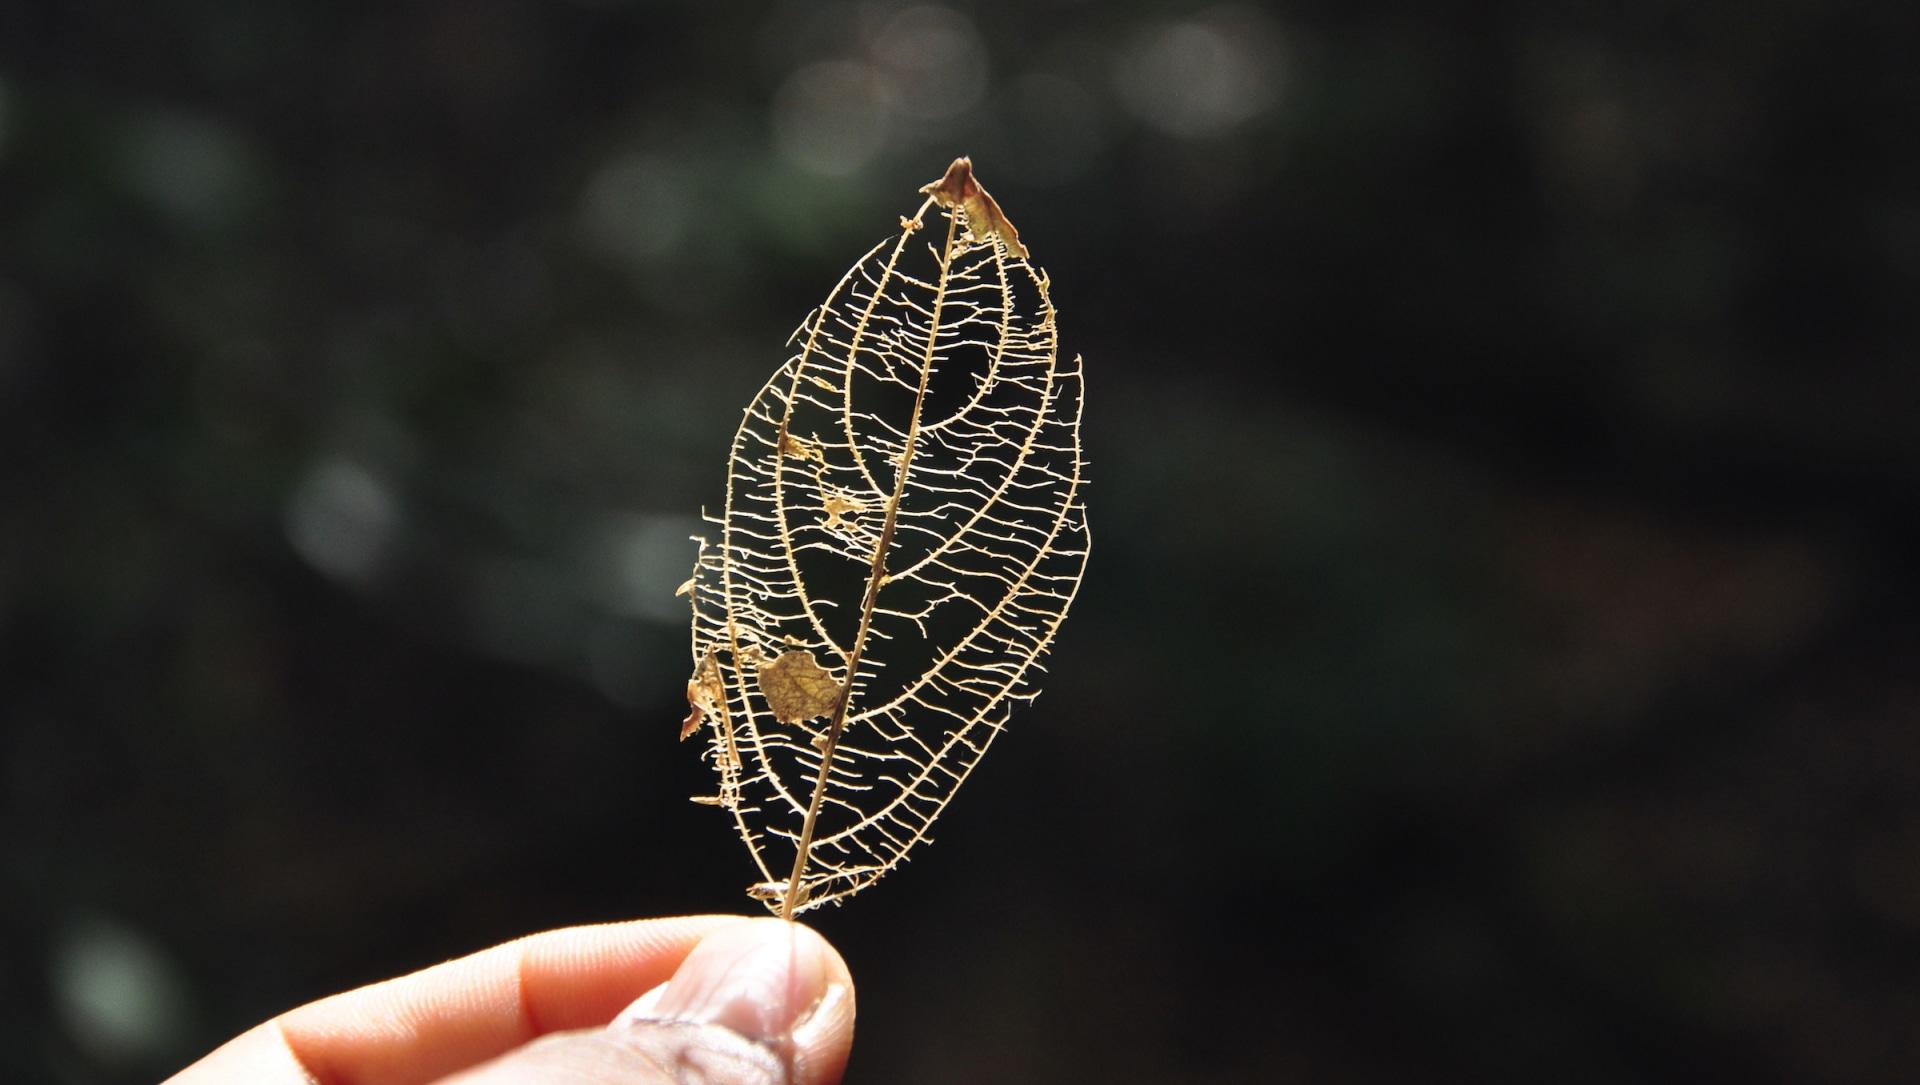 Dismantling a Misnomer: Do Fallen Leaves Litter?